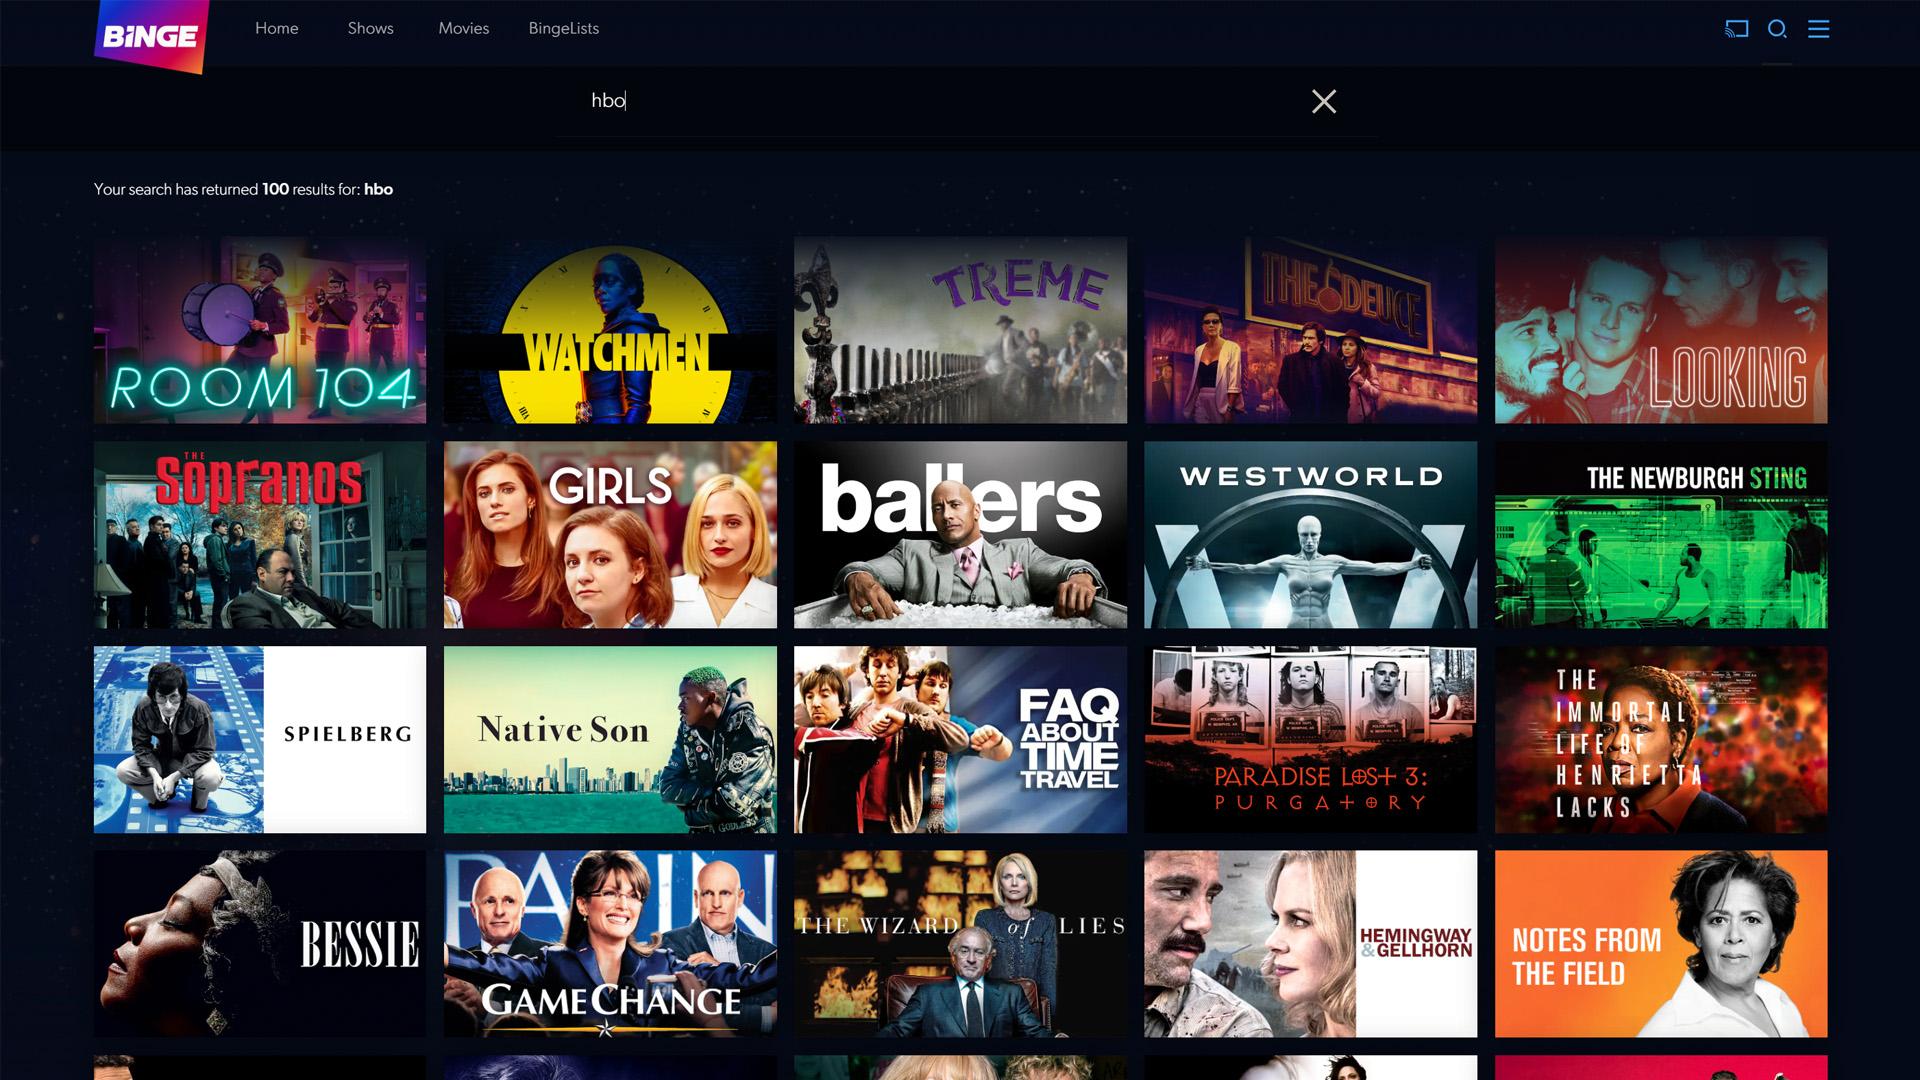 HBO on Binge